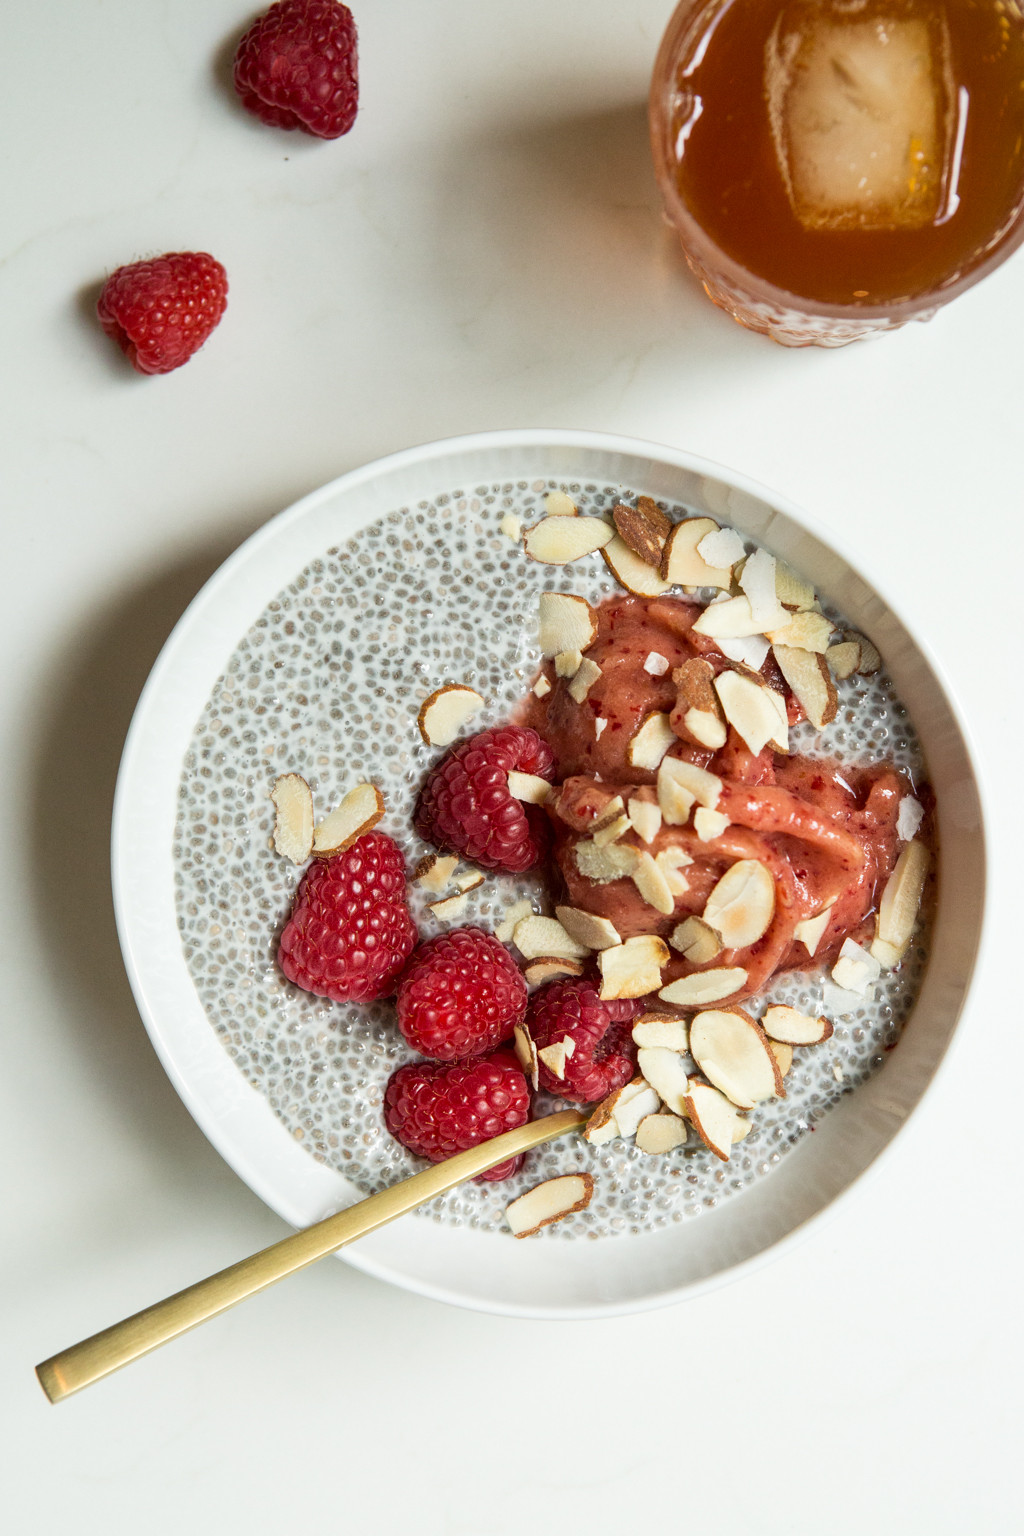 Chia Seed Breakfast Recipe  Basic Chia Seed Pudding — Oh She Glows